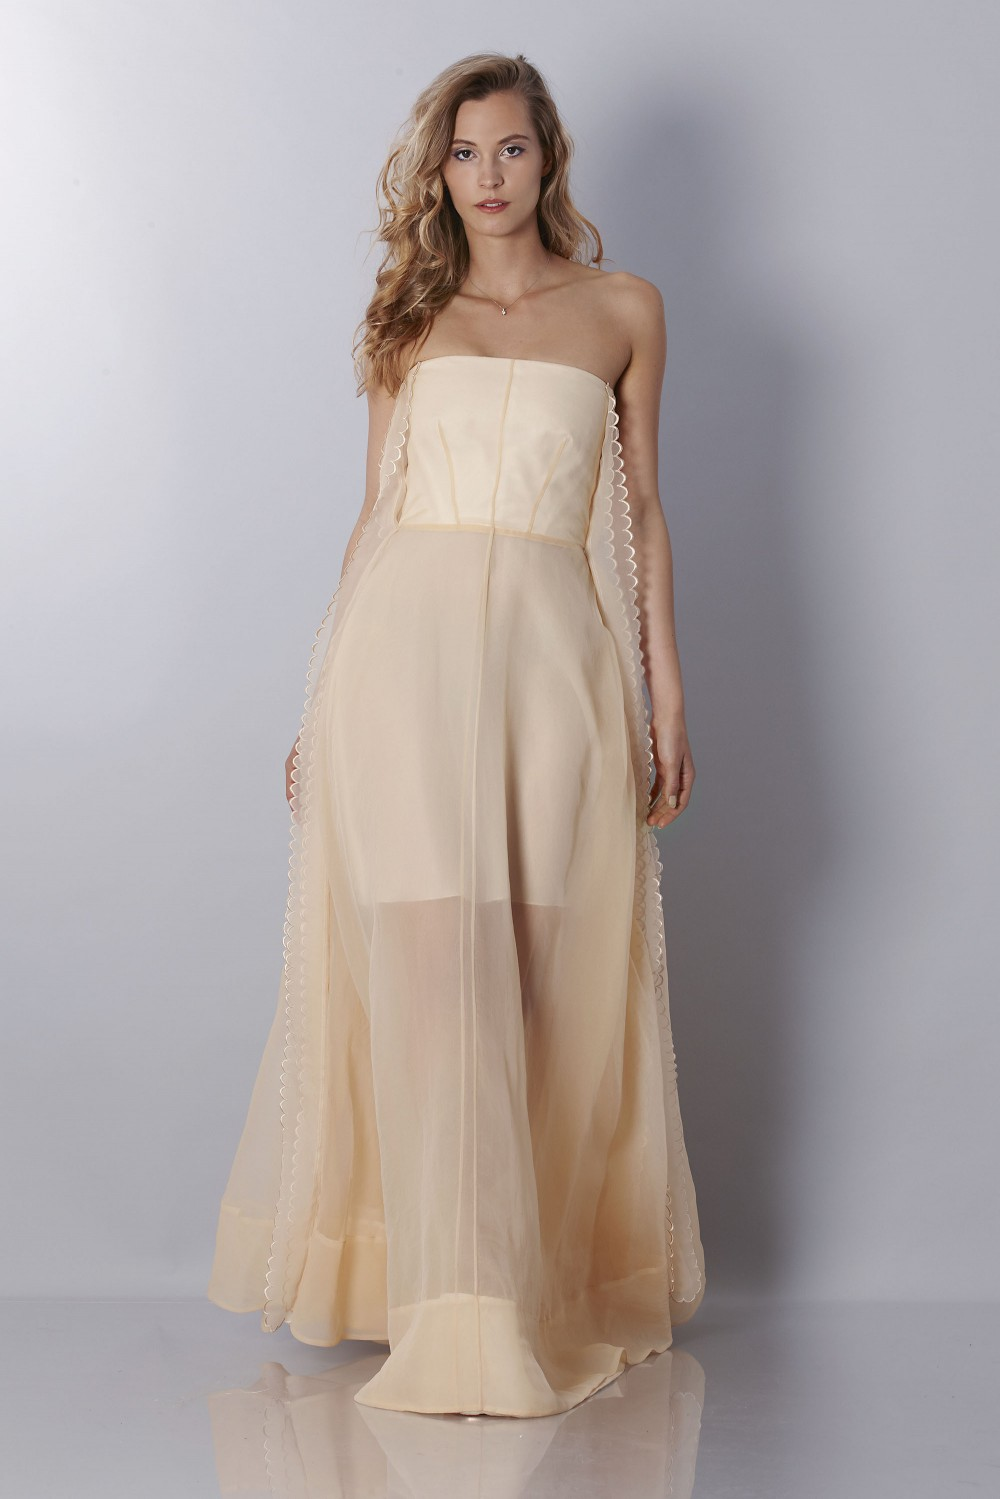 Ivory bustier dress